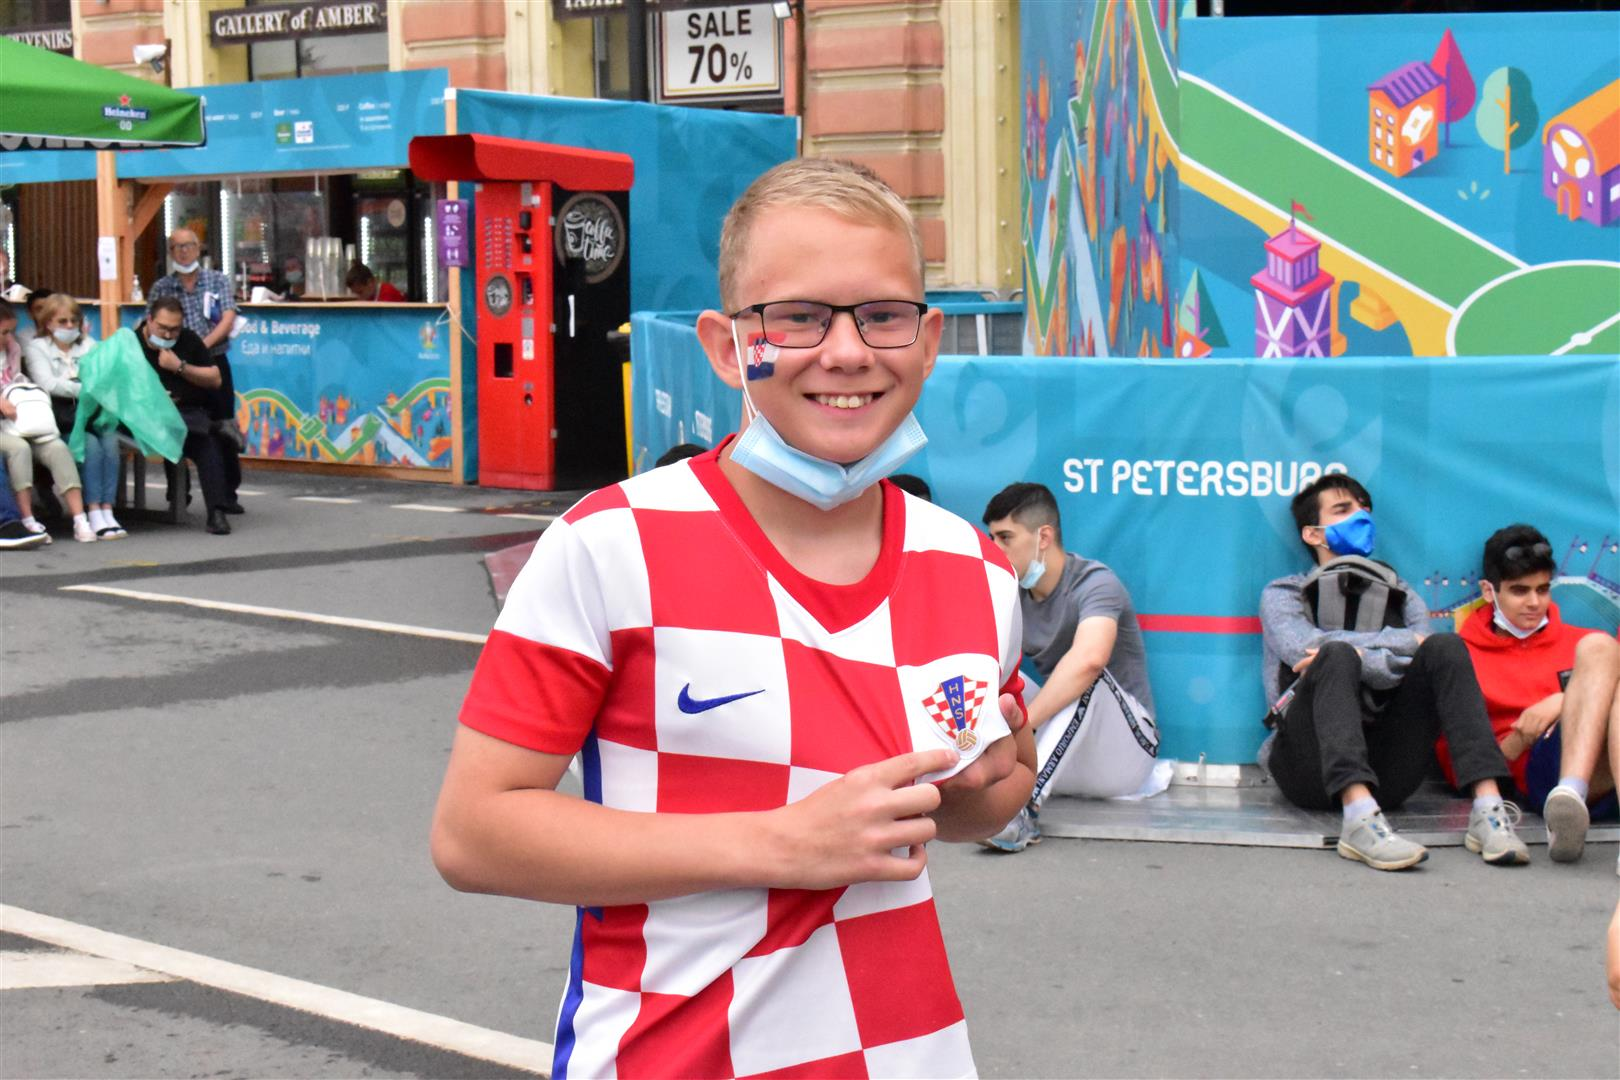 euro 2020 евро 2020 испания хорватия франция швейцария чемпионат европы по футболу кто победил